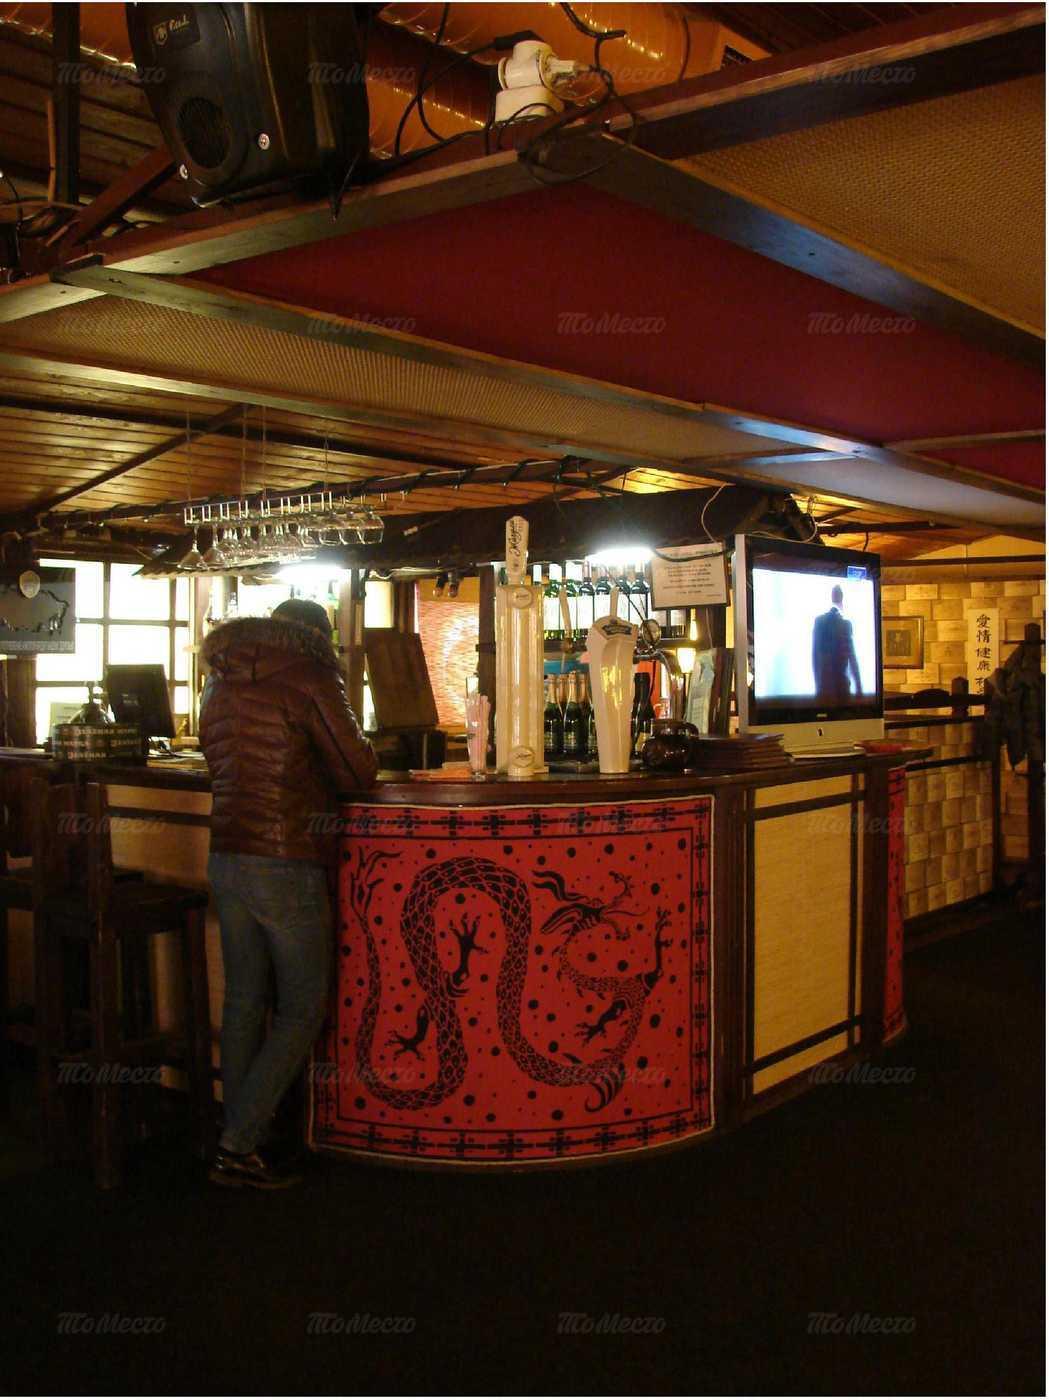 Меню бара, кафе Бар Босс (BarBoss) на улице Ванеевой